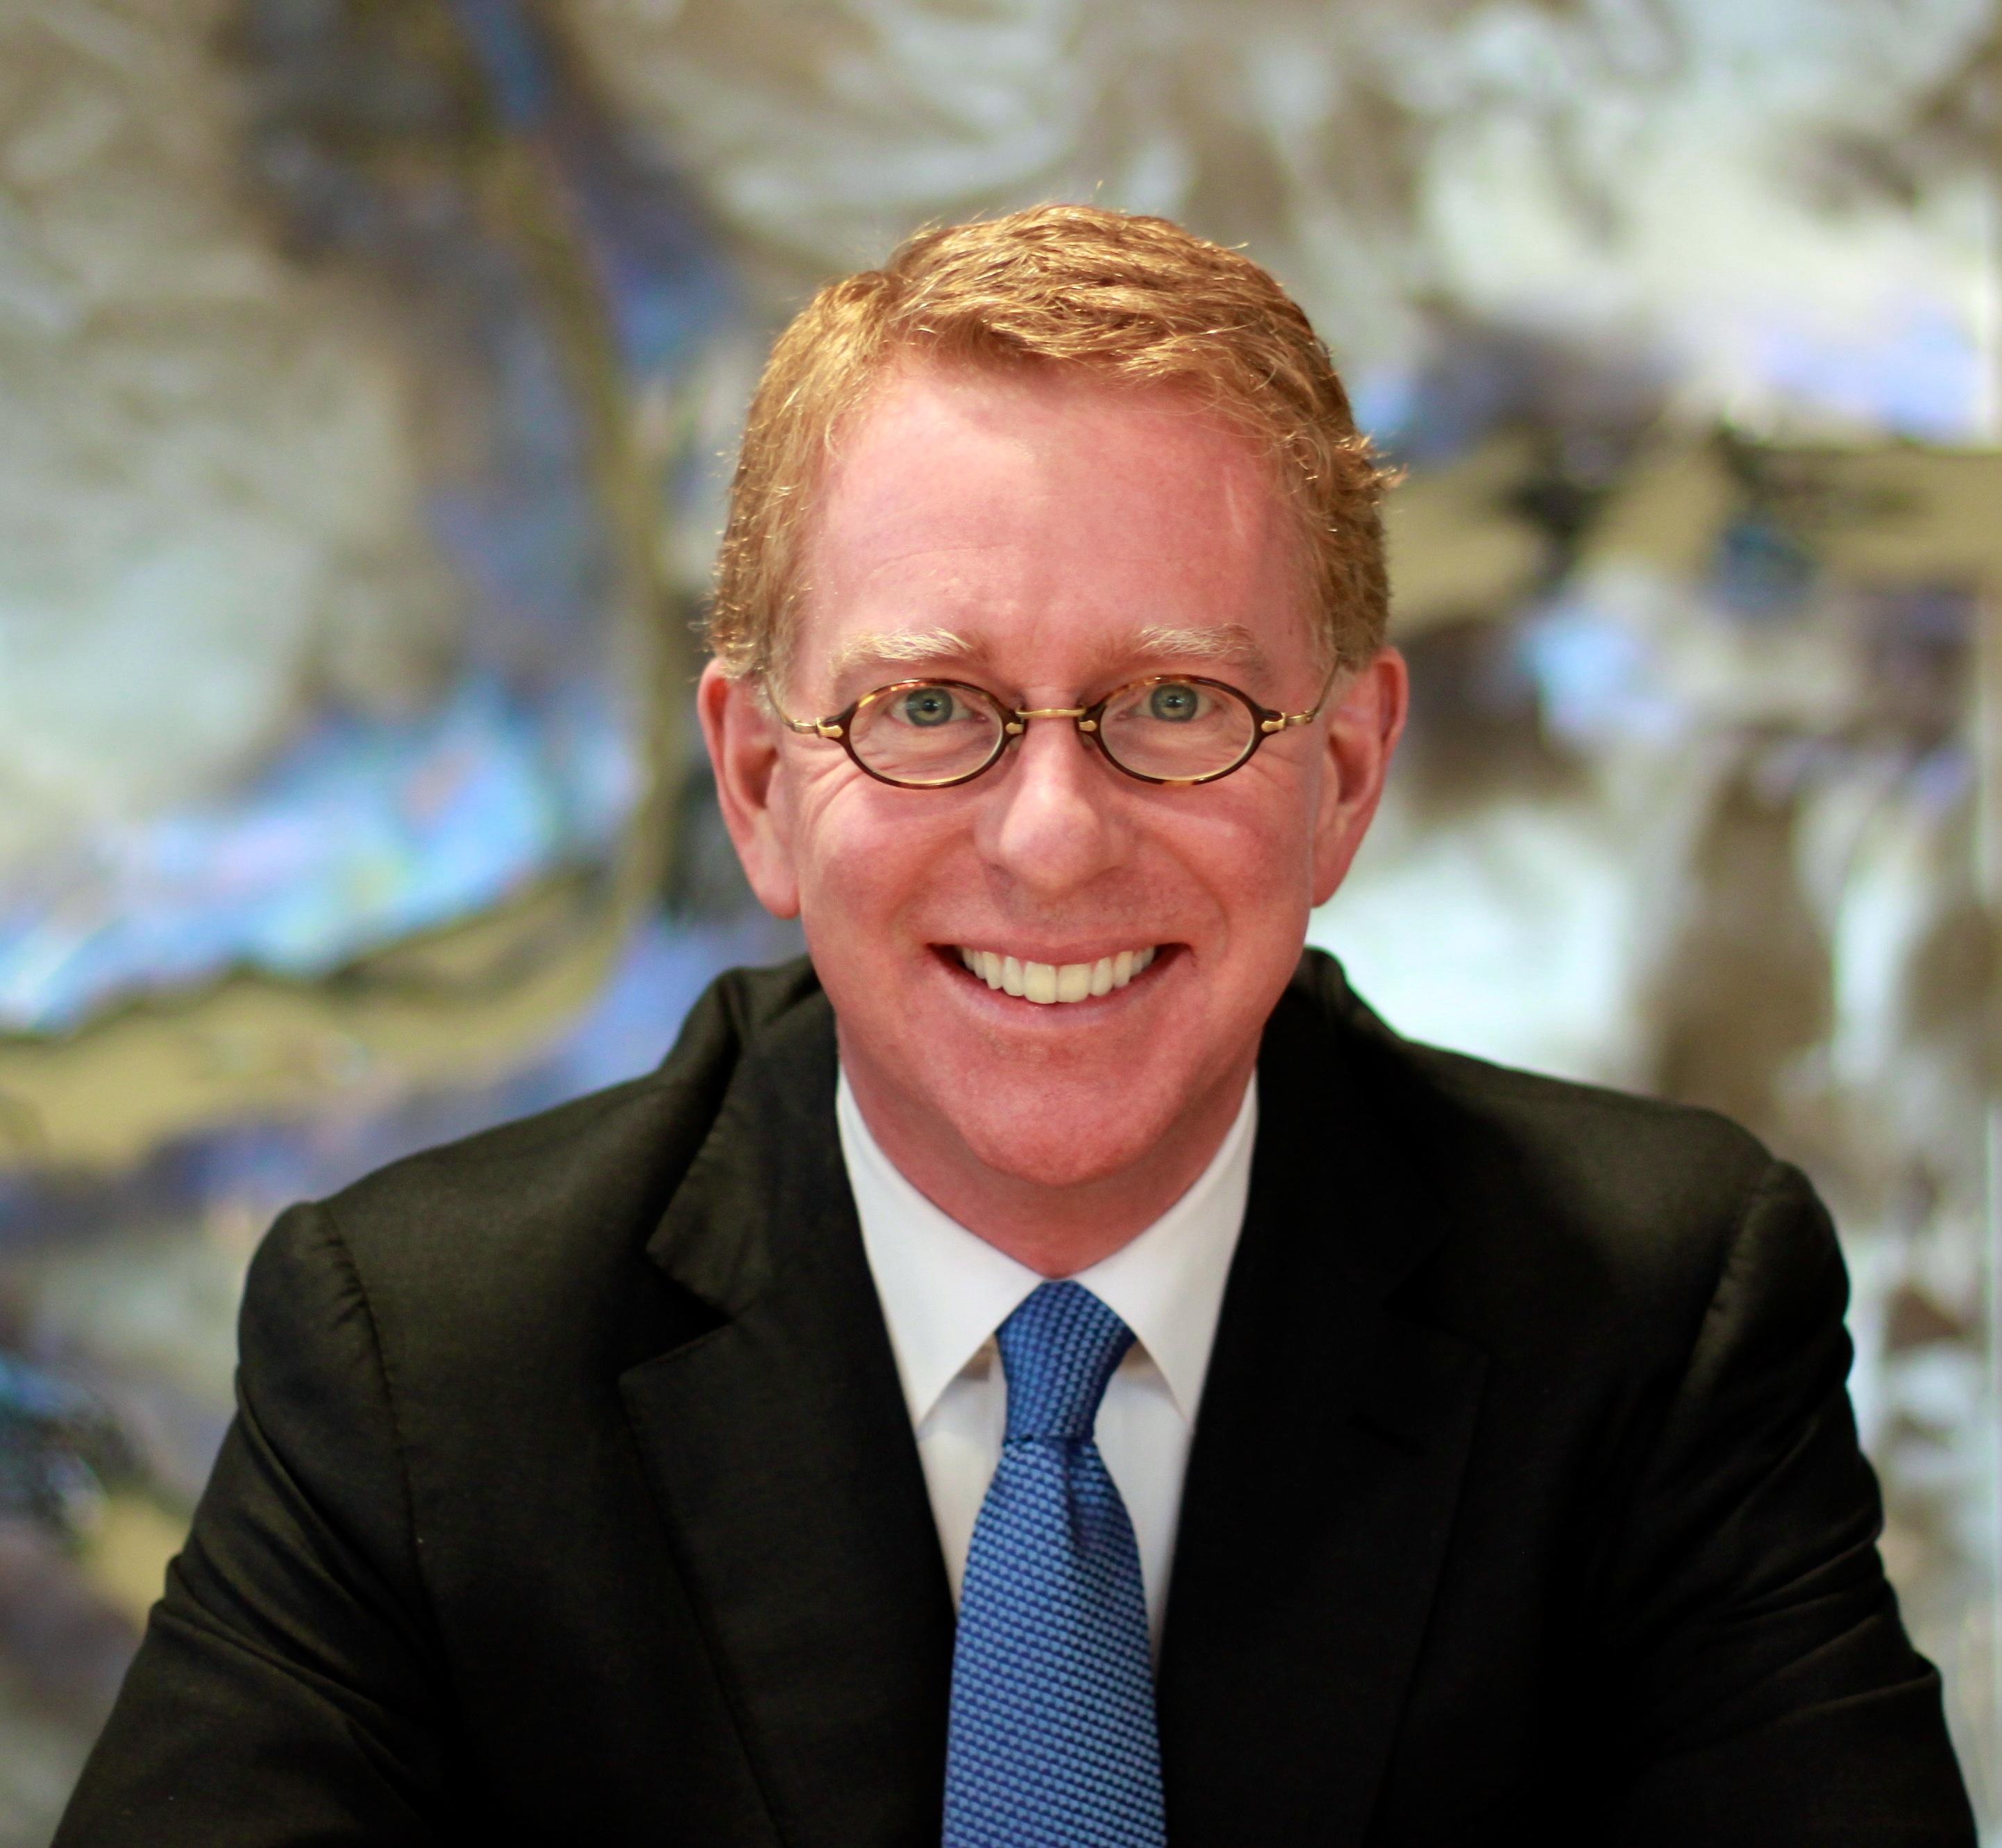 Testimonial by Patrick Mahaffy, CEO Clovis Oncology